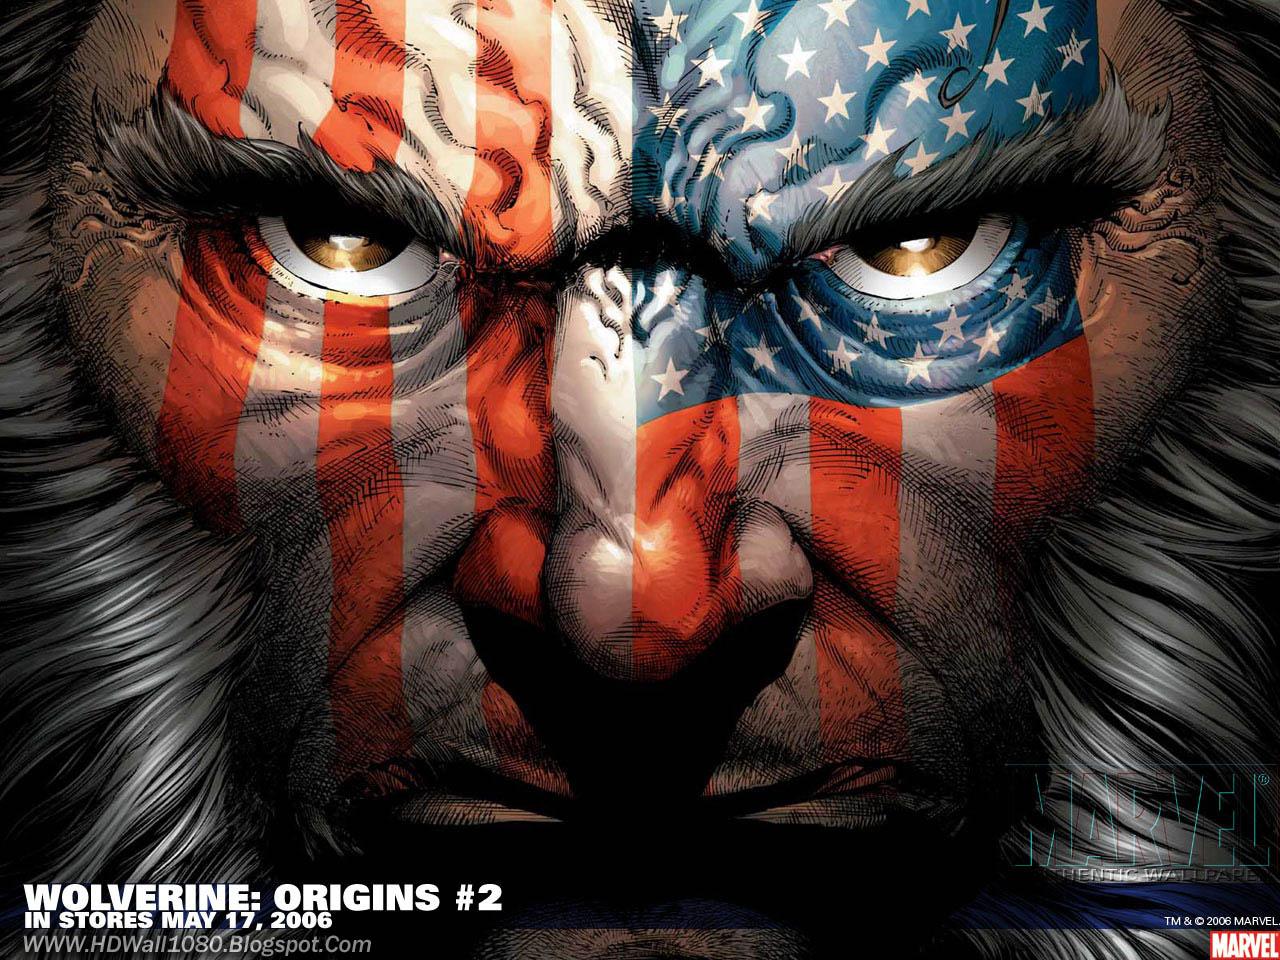 http://4.bp.blogspot.com/-UBz2mw5sgdM/UL9KADHMr9I/AAAAAAAABPk/S4ouQh2QfM0/s1600/X+Men+Wolverine+Wallpaper+Multicolor.jpg